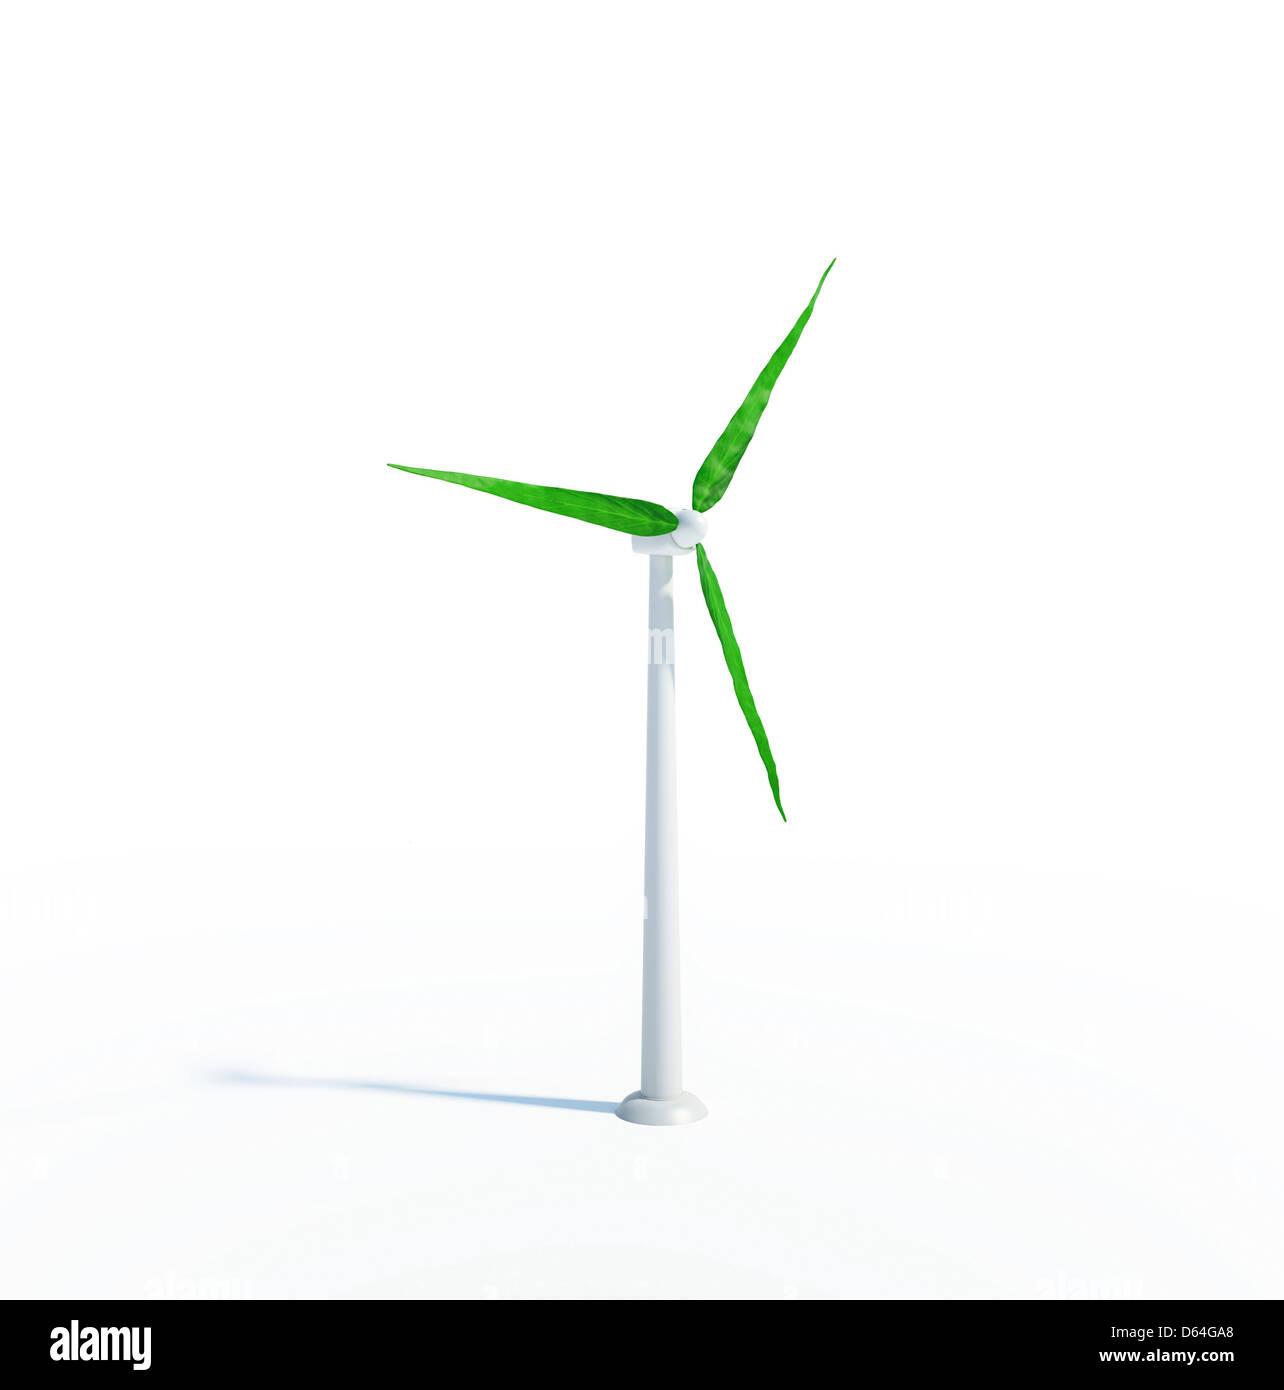 Grüne Energie, konzeptuellen Kunstwerk Stockbild